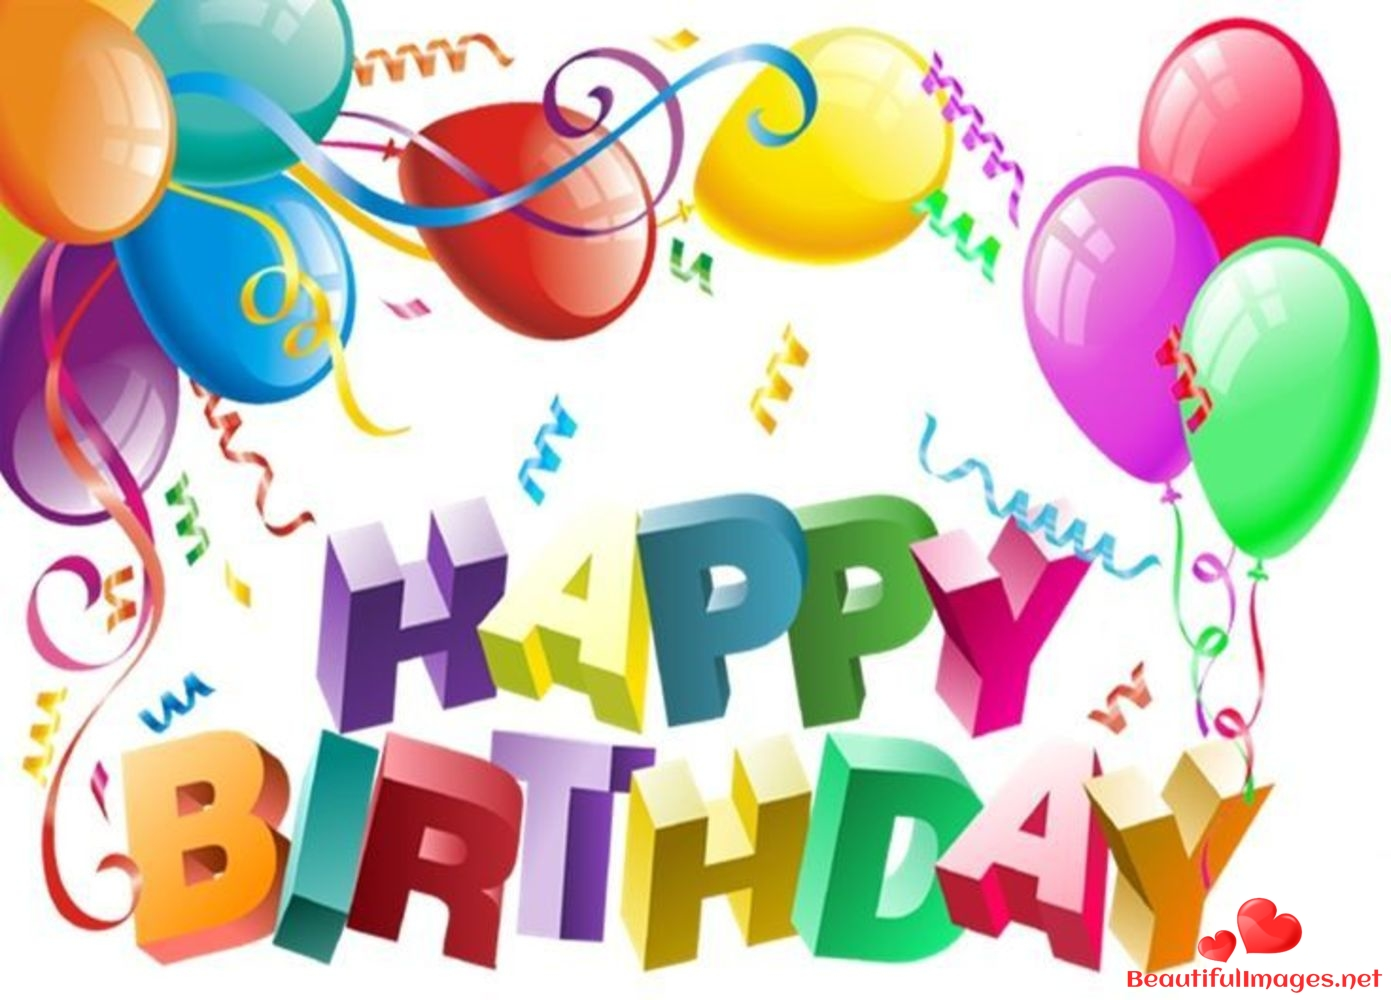 Happy-Birthday-Images-Pictures-Whatsapp-240